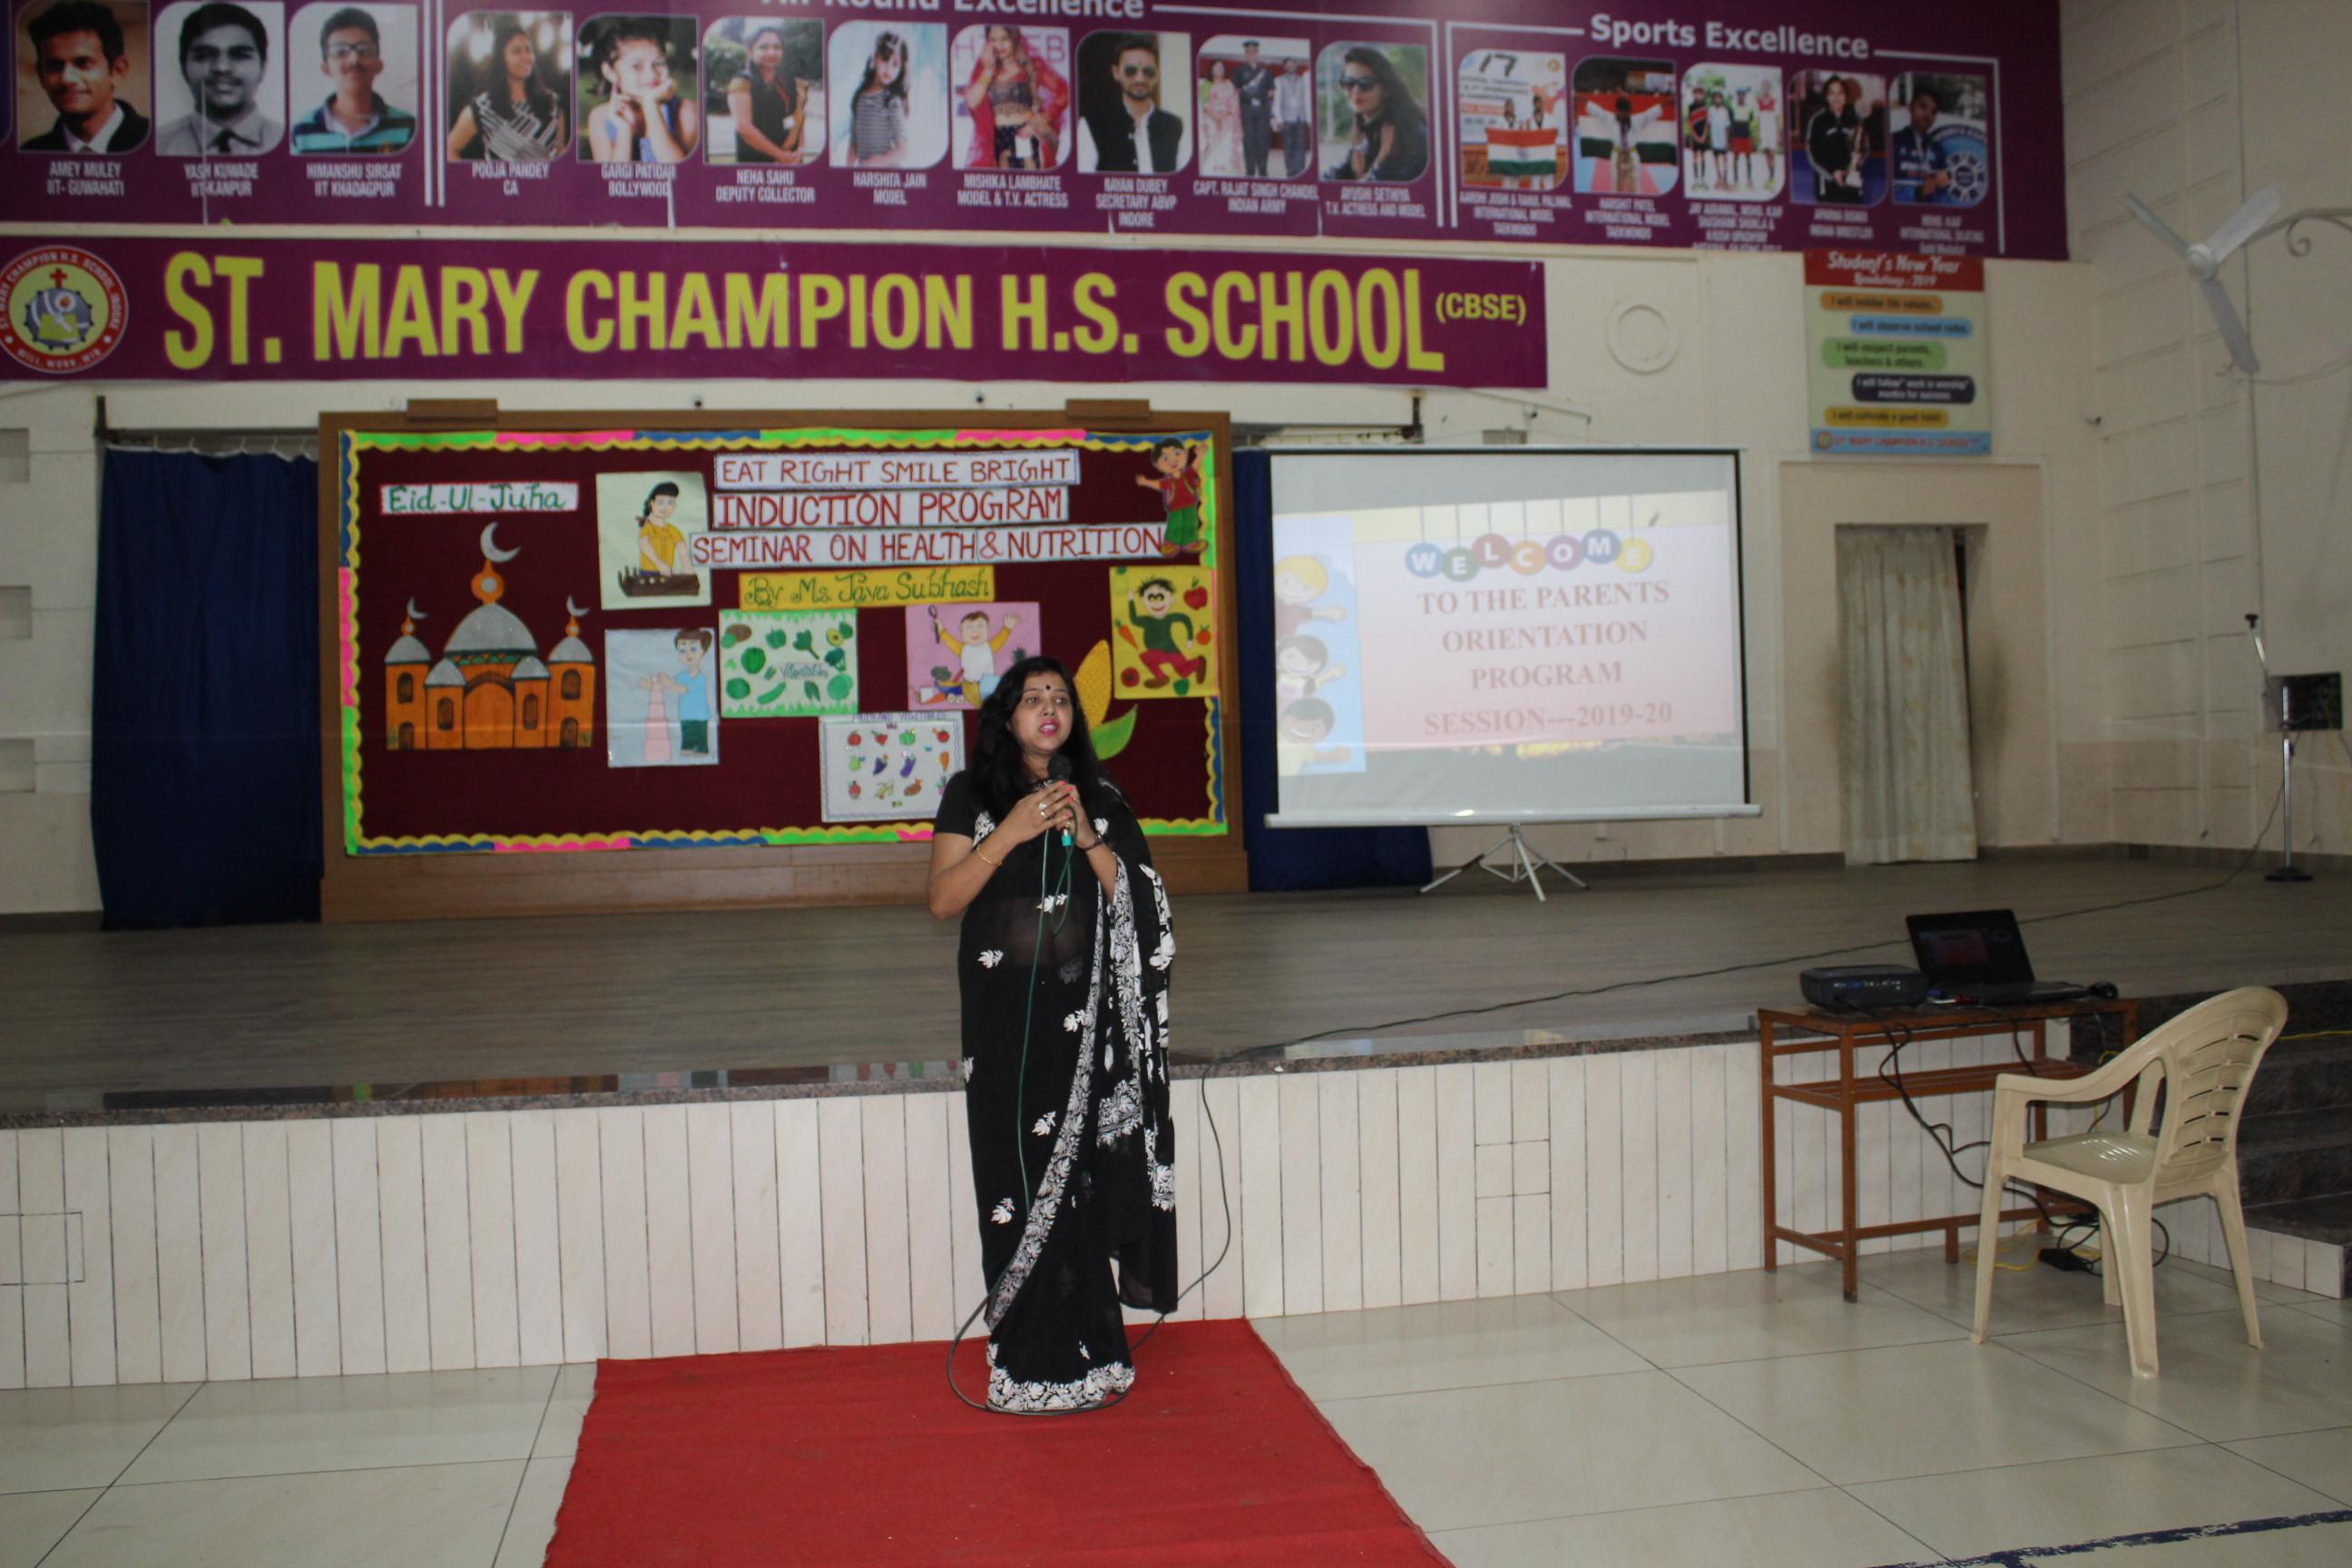 Health and Nutrition Seminar